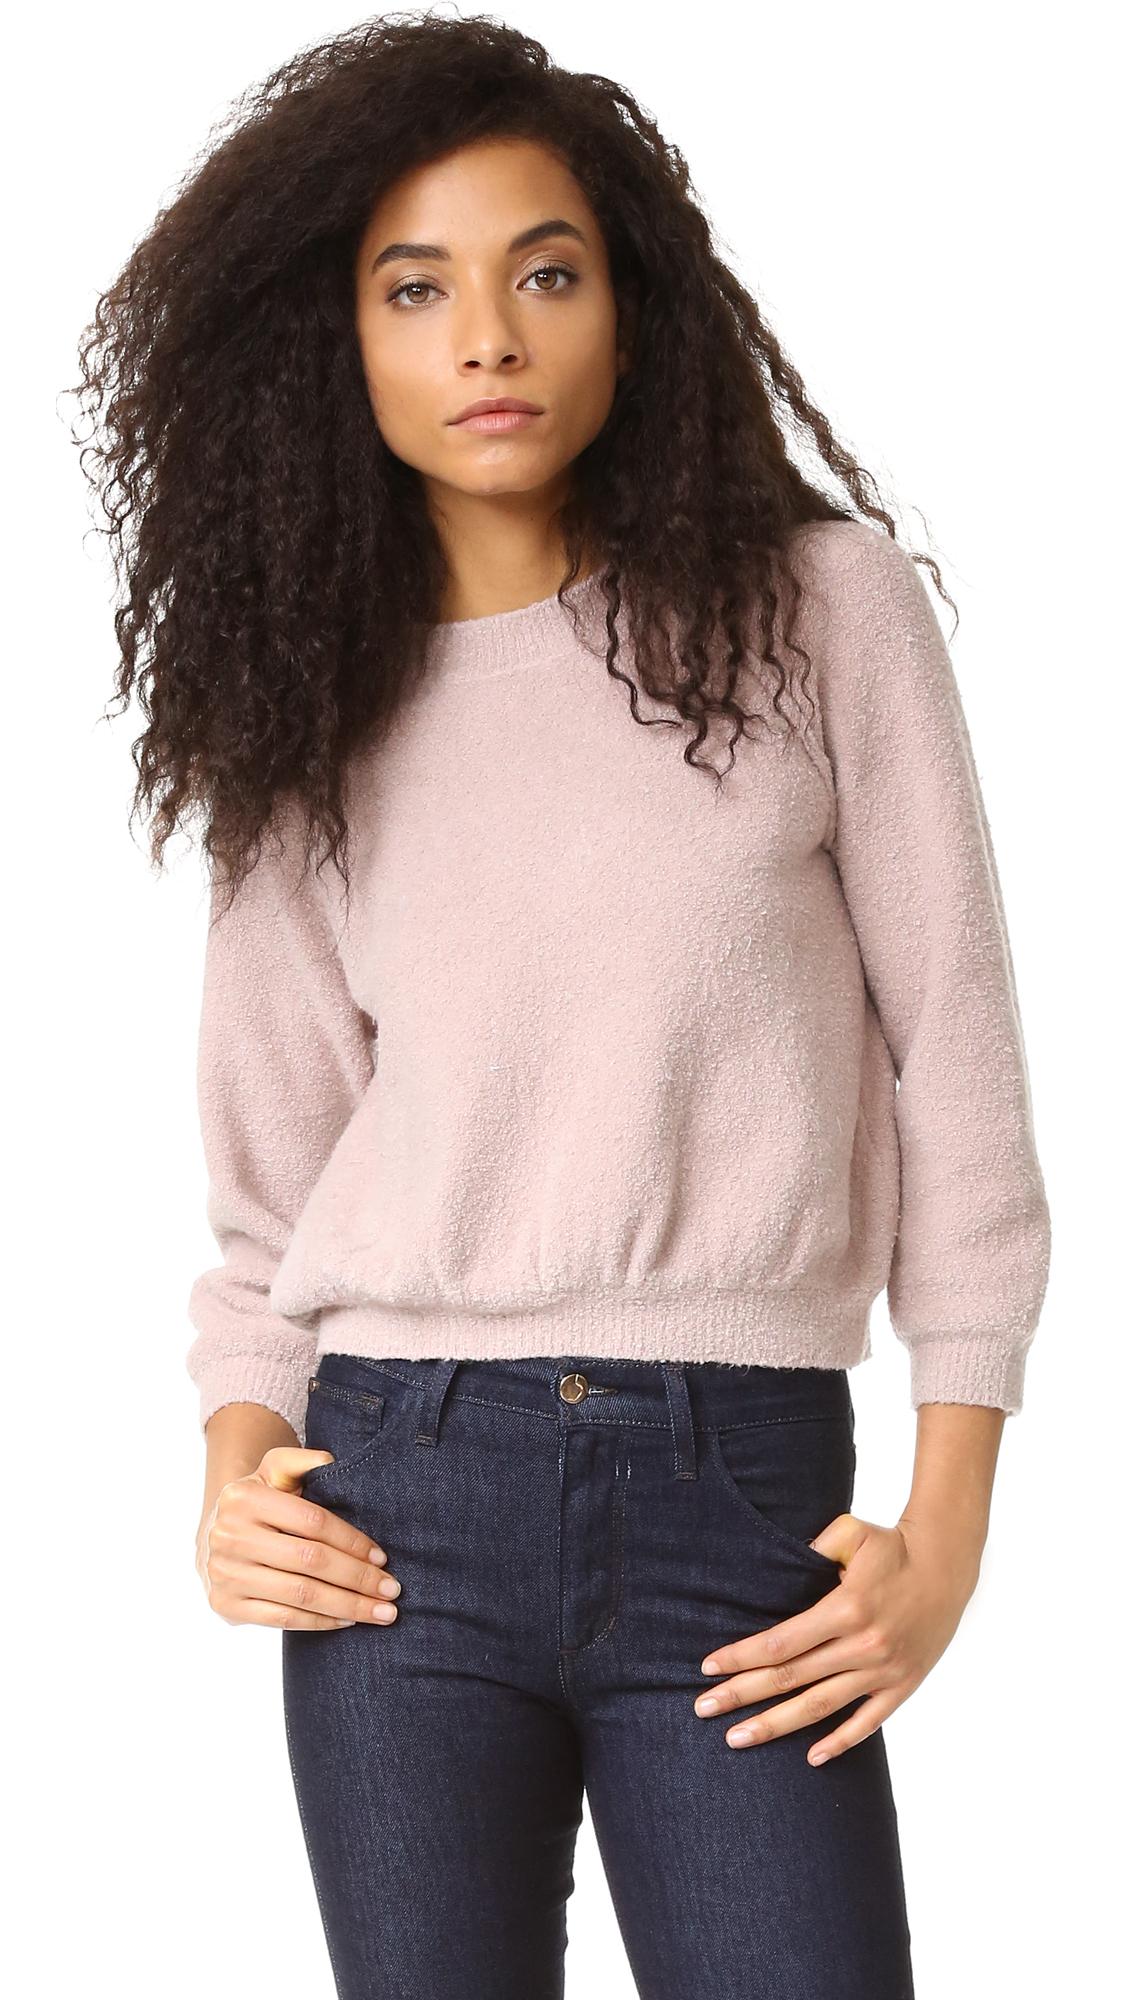 La Vie Rebecca Taylor Boucle Stretch Pullover - Blush at Shopbop